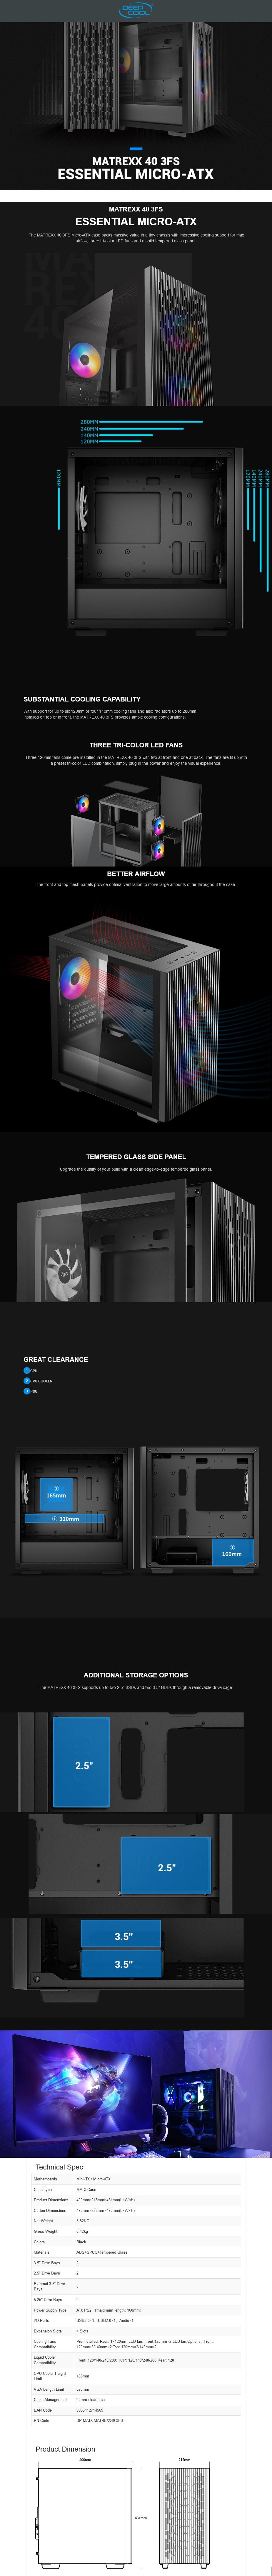 deepcool-matrexx-40-3fs-tempered-glass-microatx-case-ac44912-12.jpg